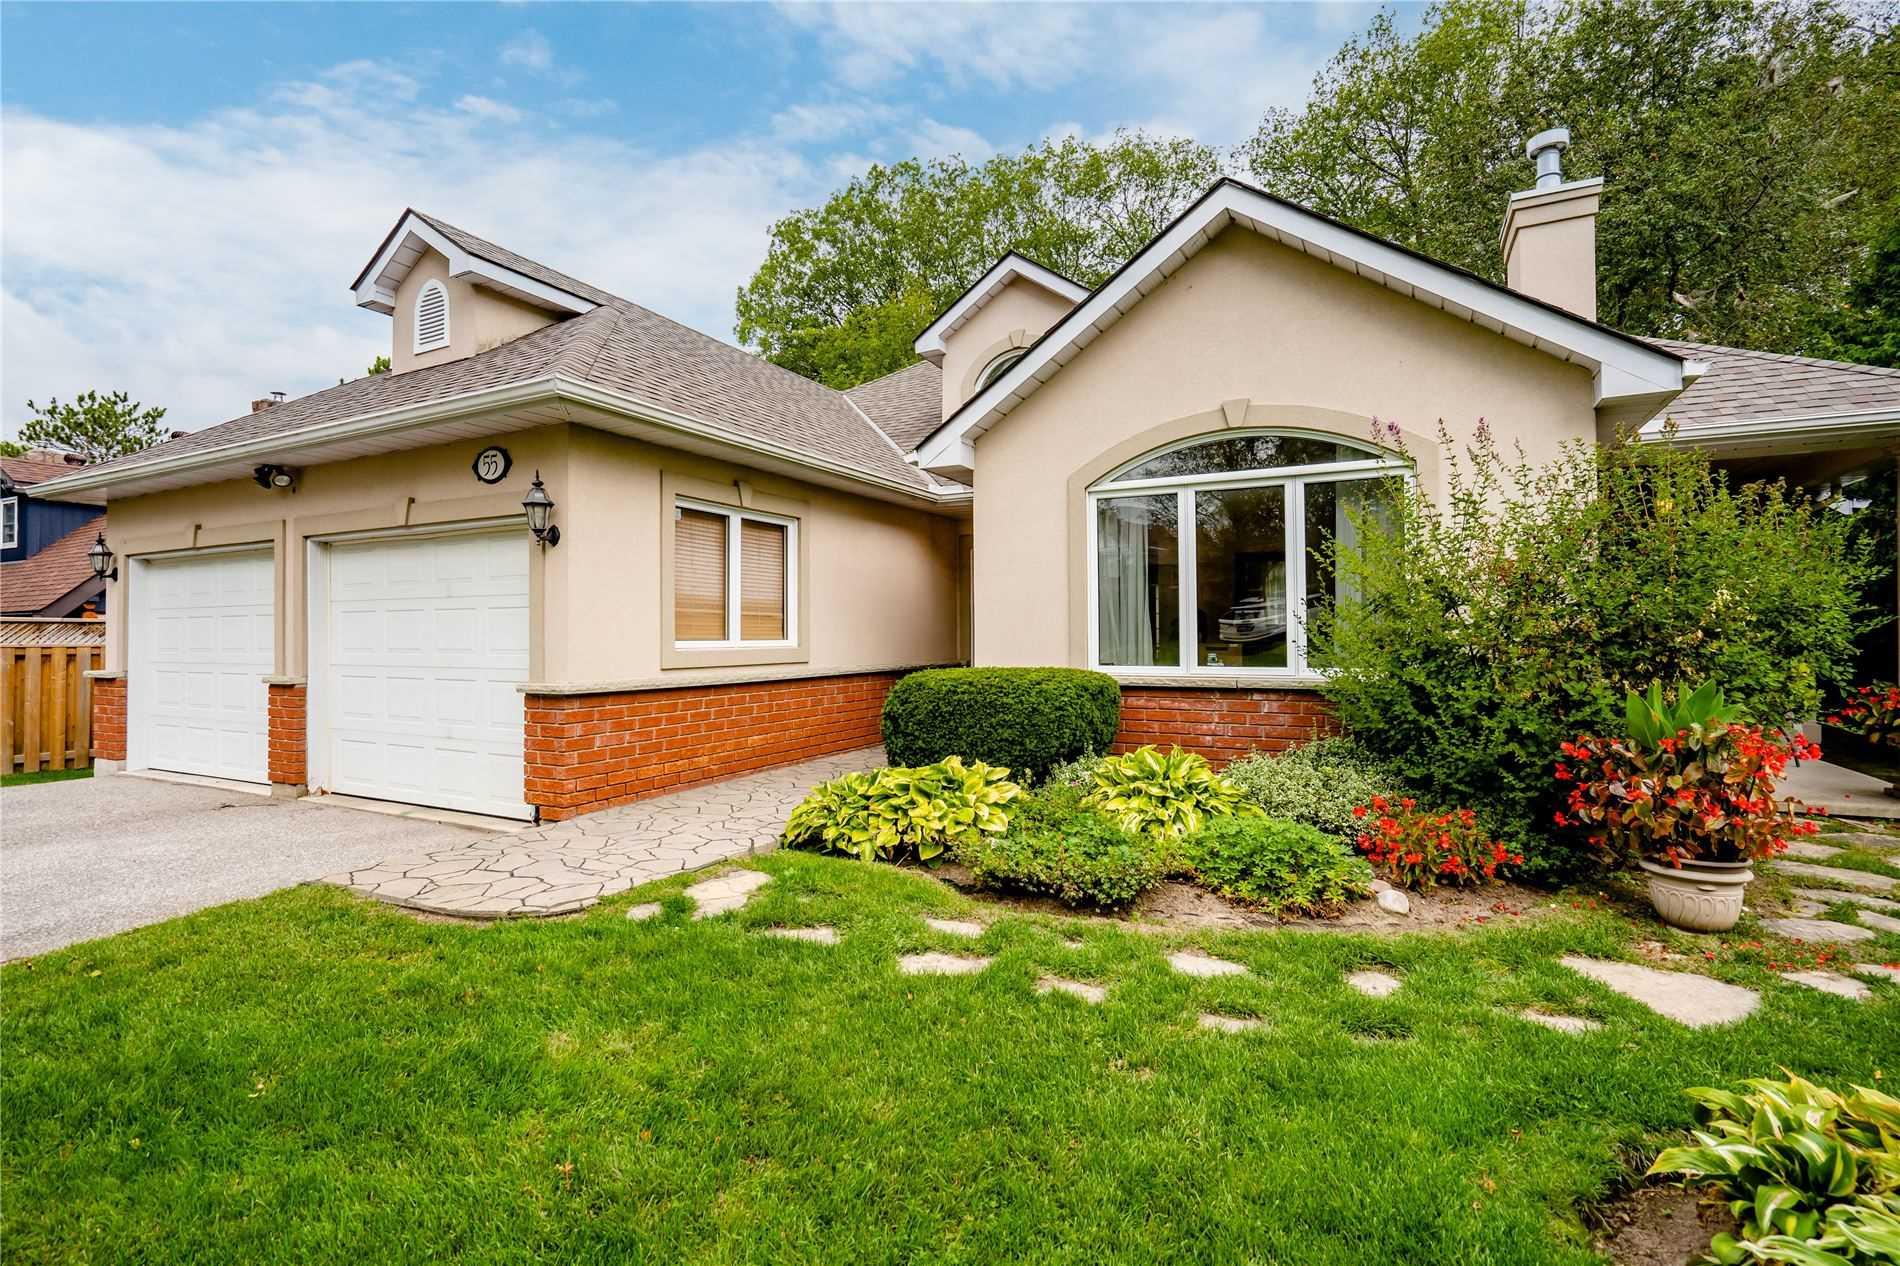 Detached house For Sale In Penetanguishene